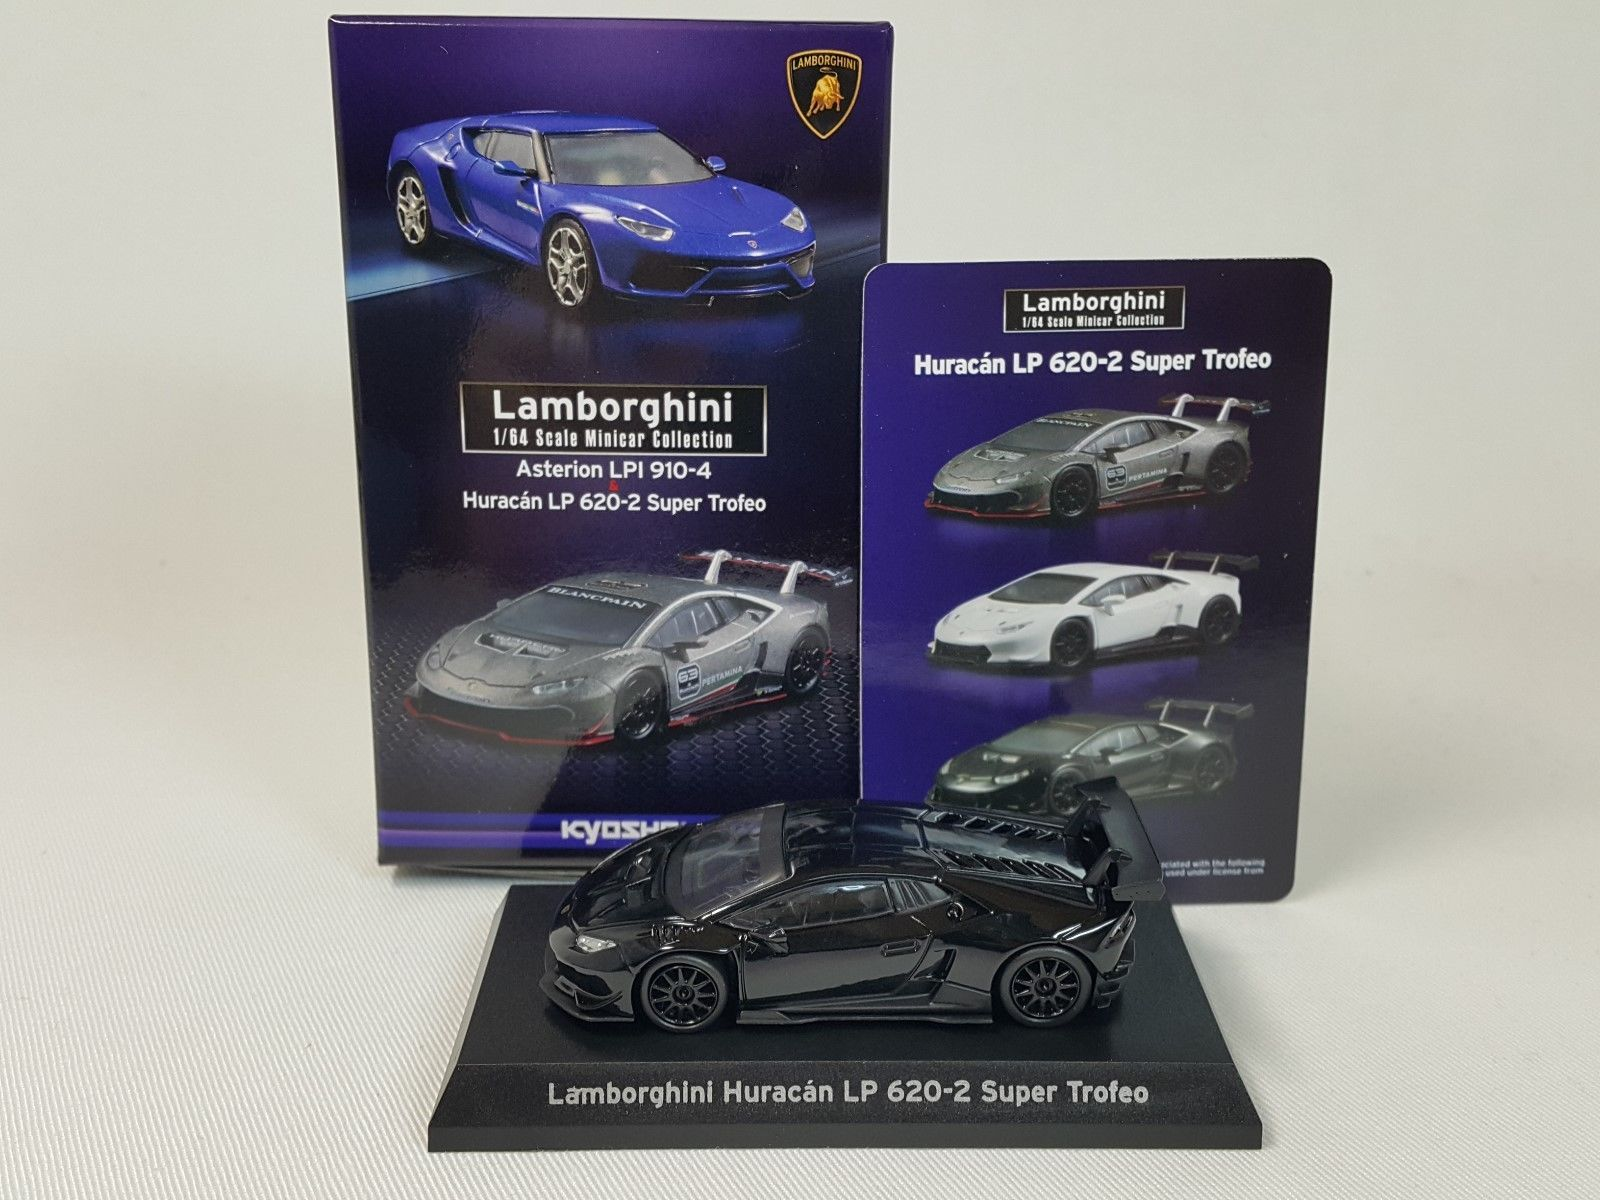 8f9c95a5308b95a5c318423140401a87 Marvelous Lamborghini Huracan Hack asphalt 8 Cars Trend